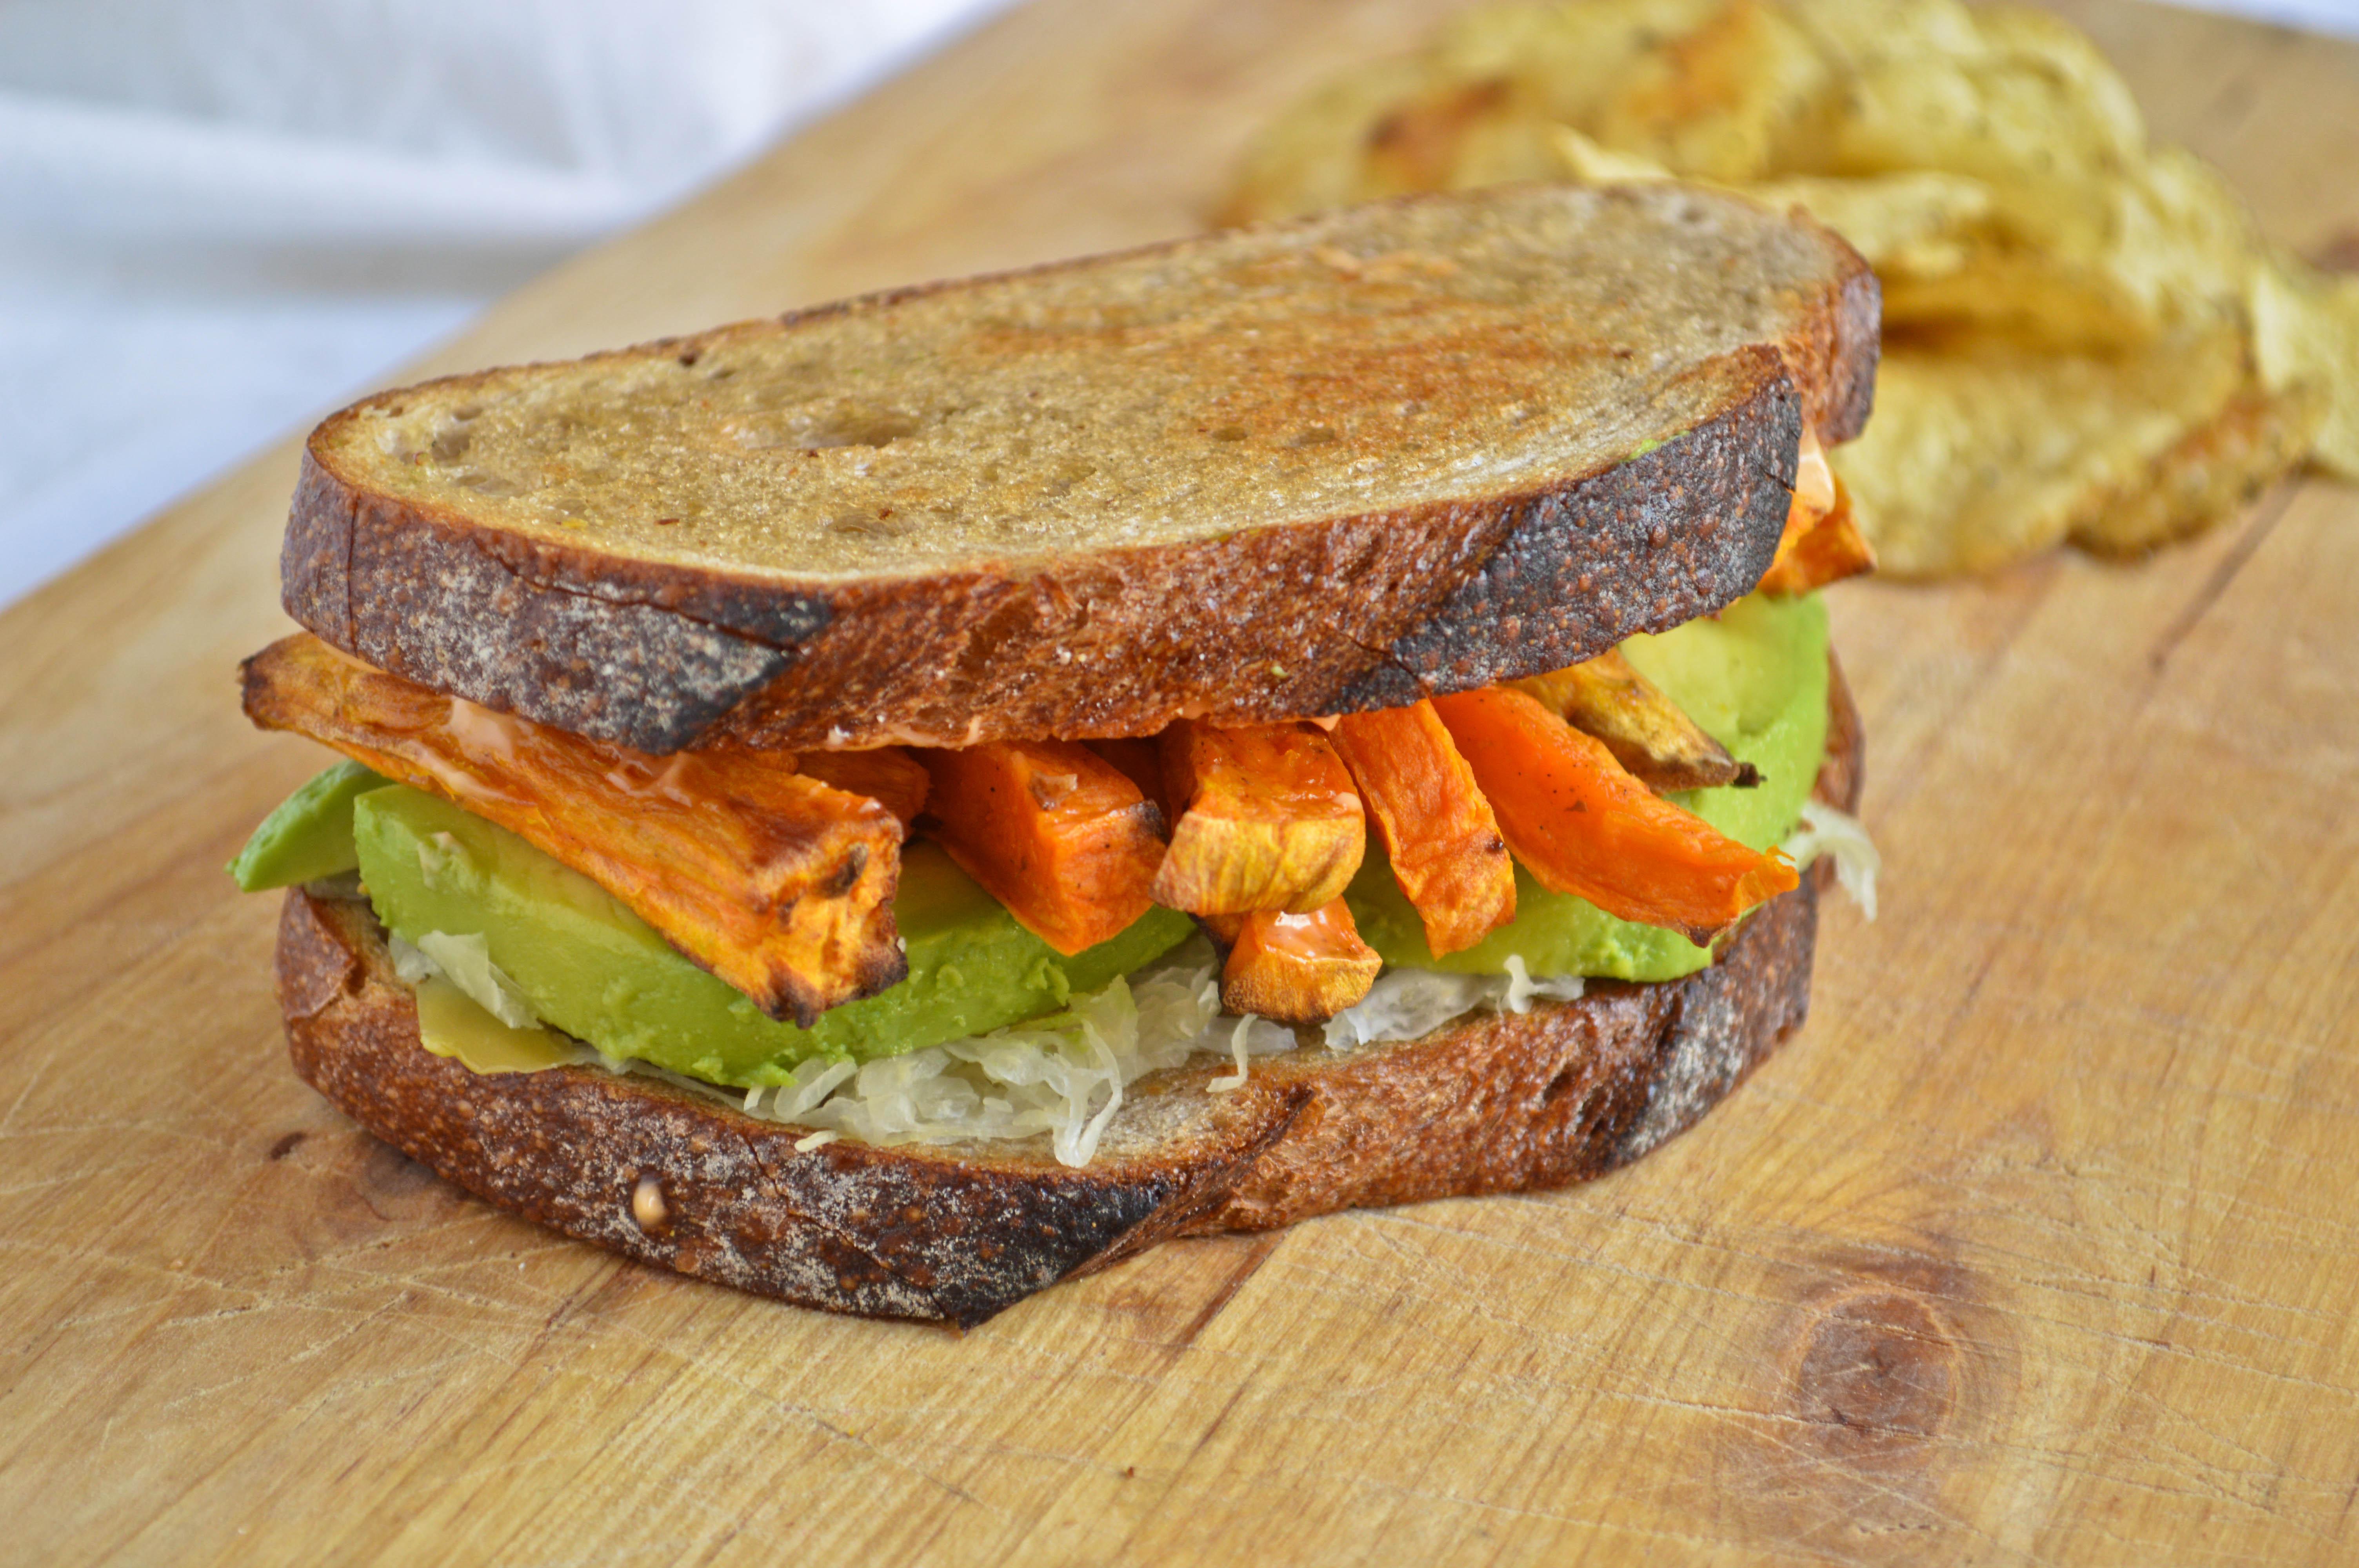 Sweet Potato and Avocado Reuben Sandwich